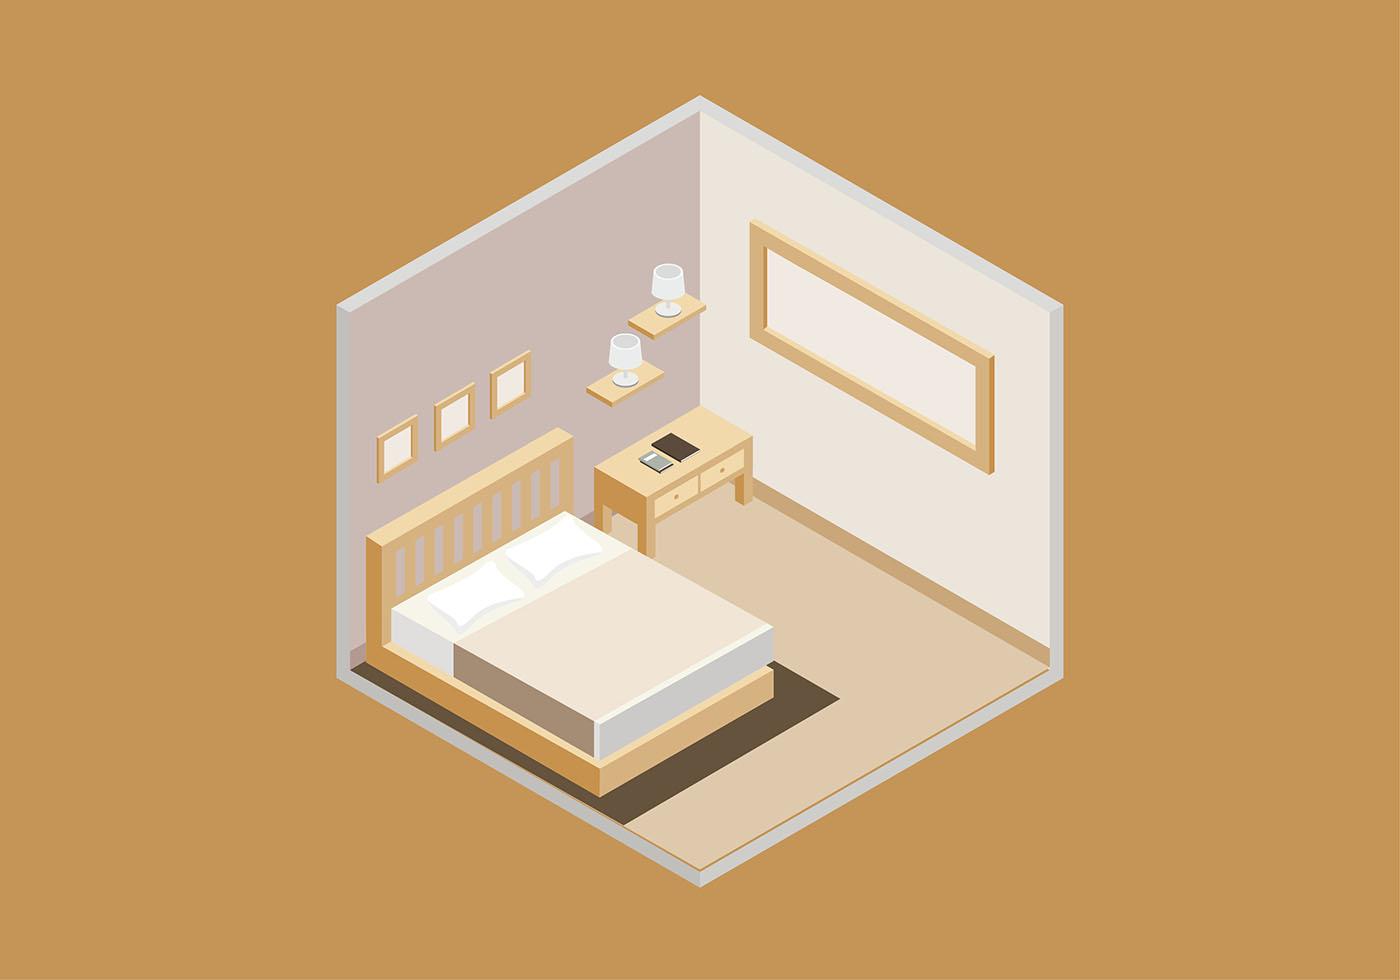 Isometric Furniture Free Vector Art 1308 Free Downloads